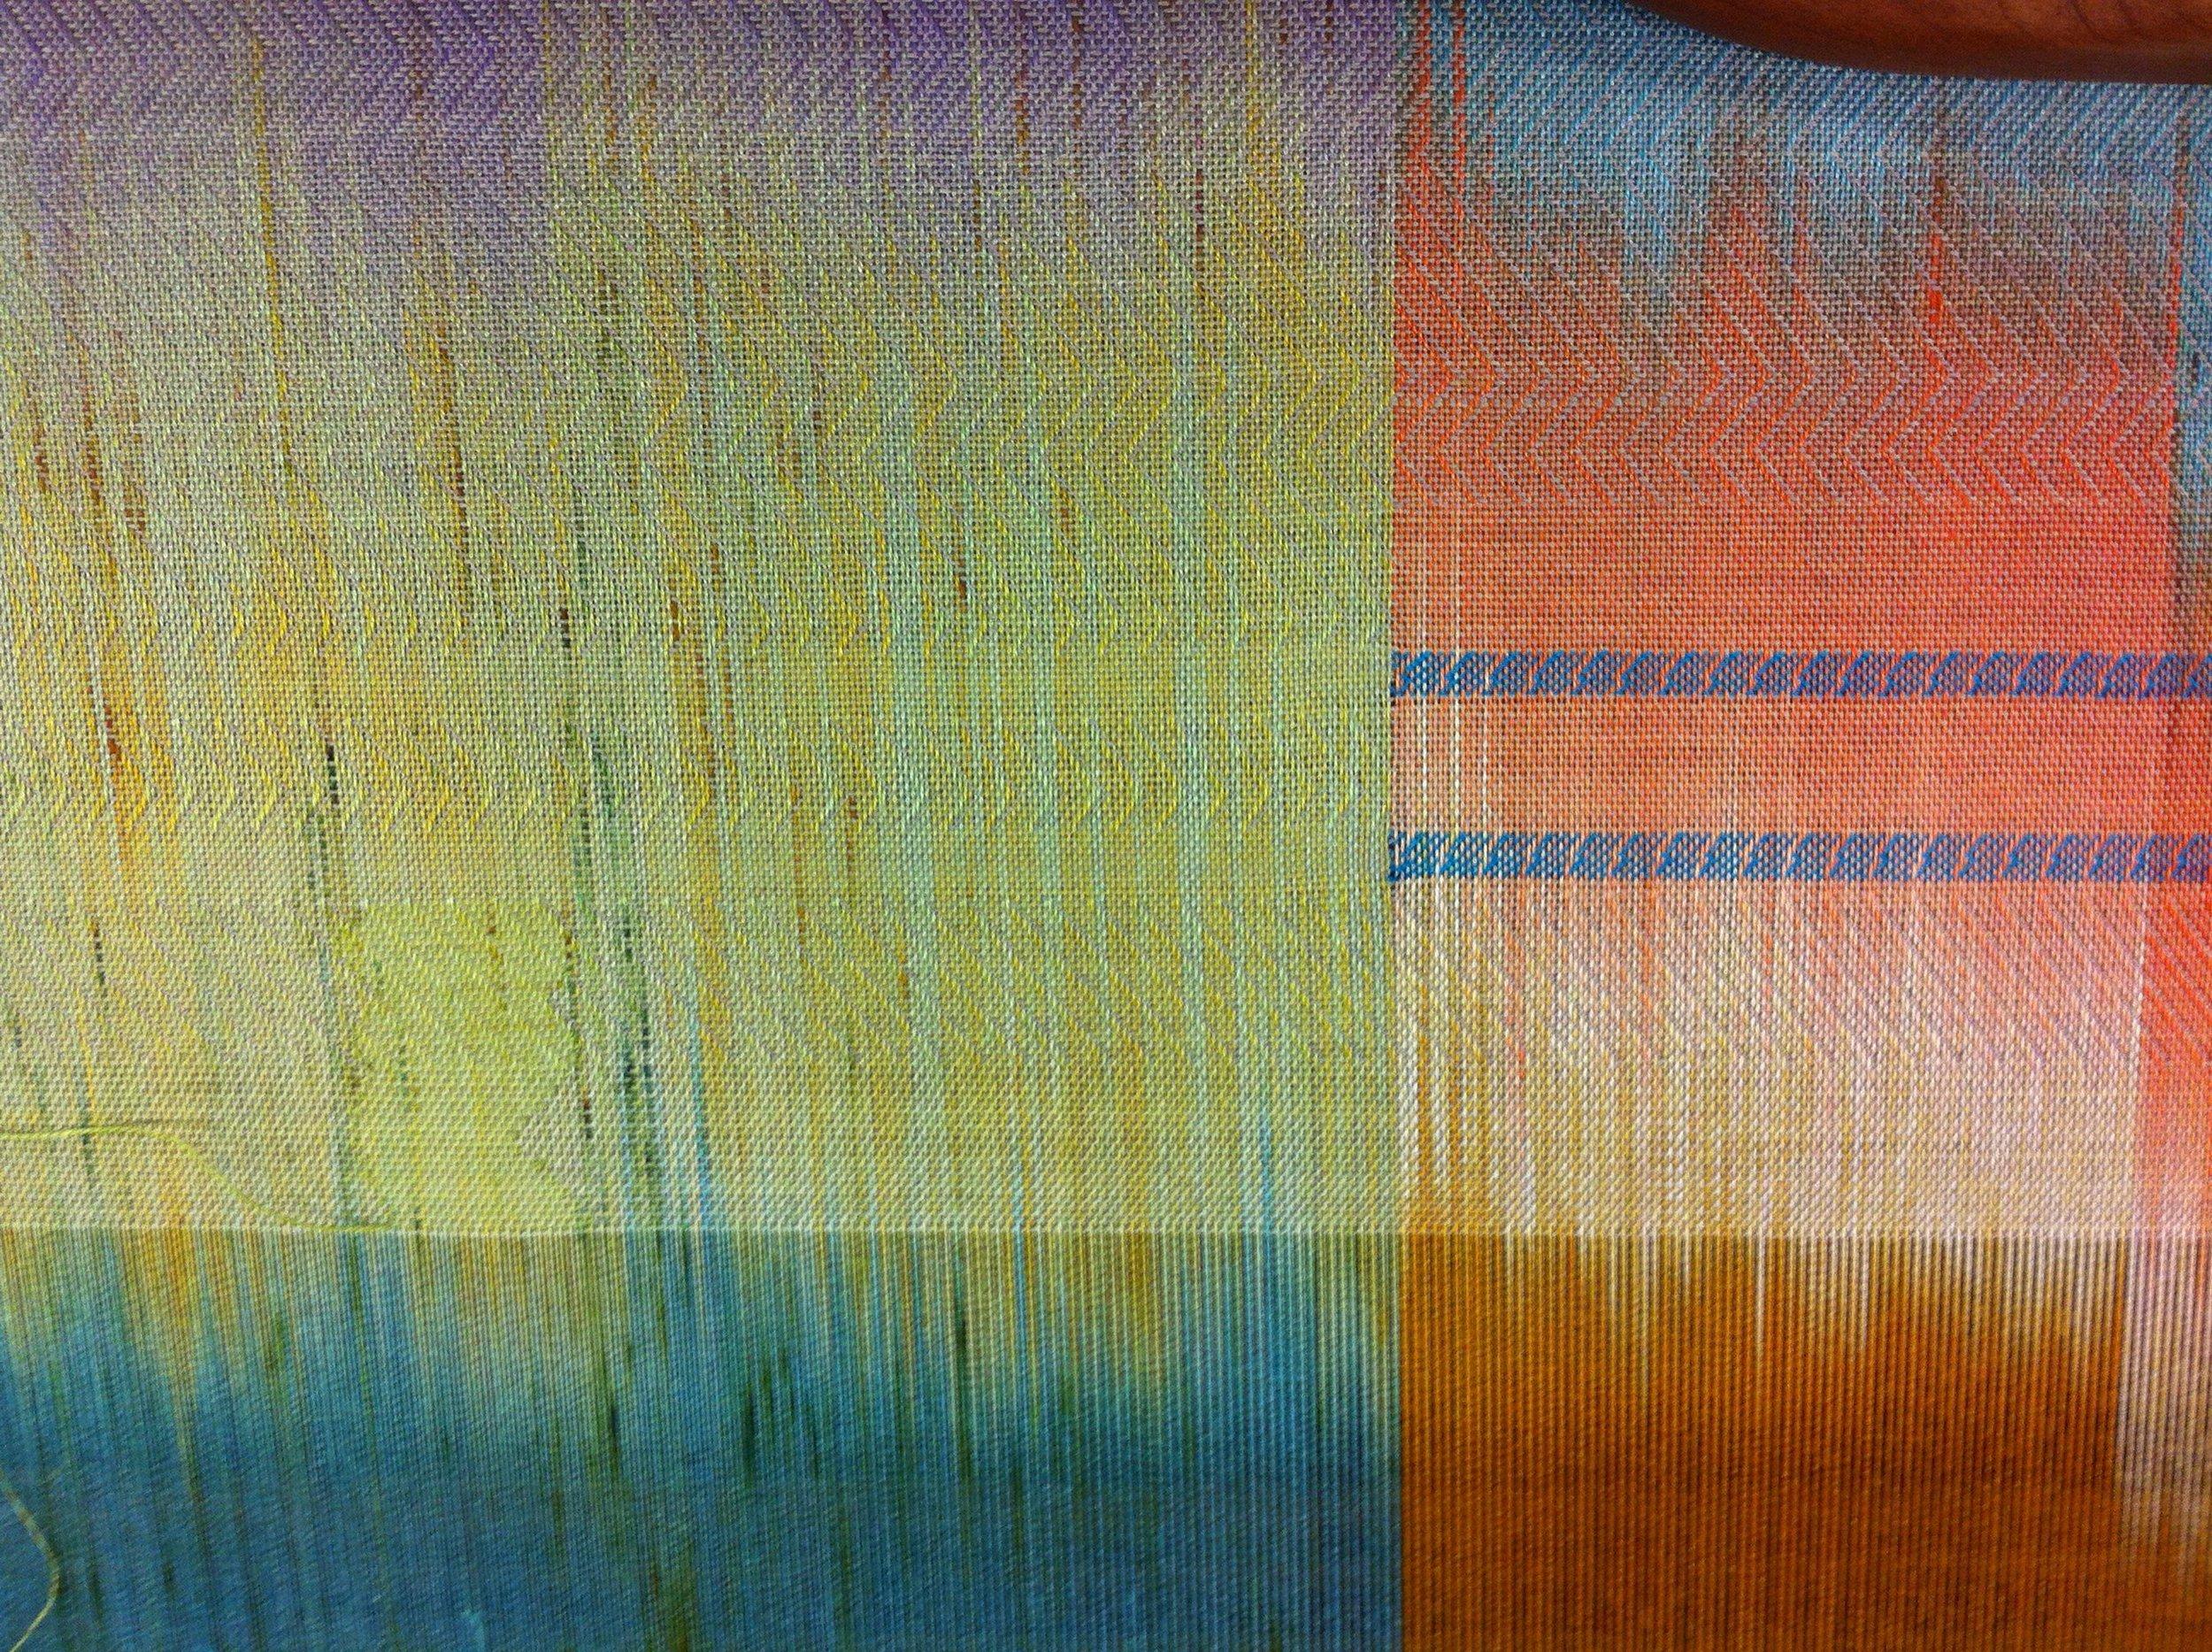 Sound + Silk - A Tactile Translation